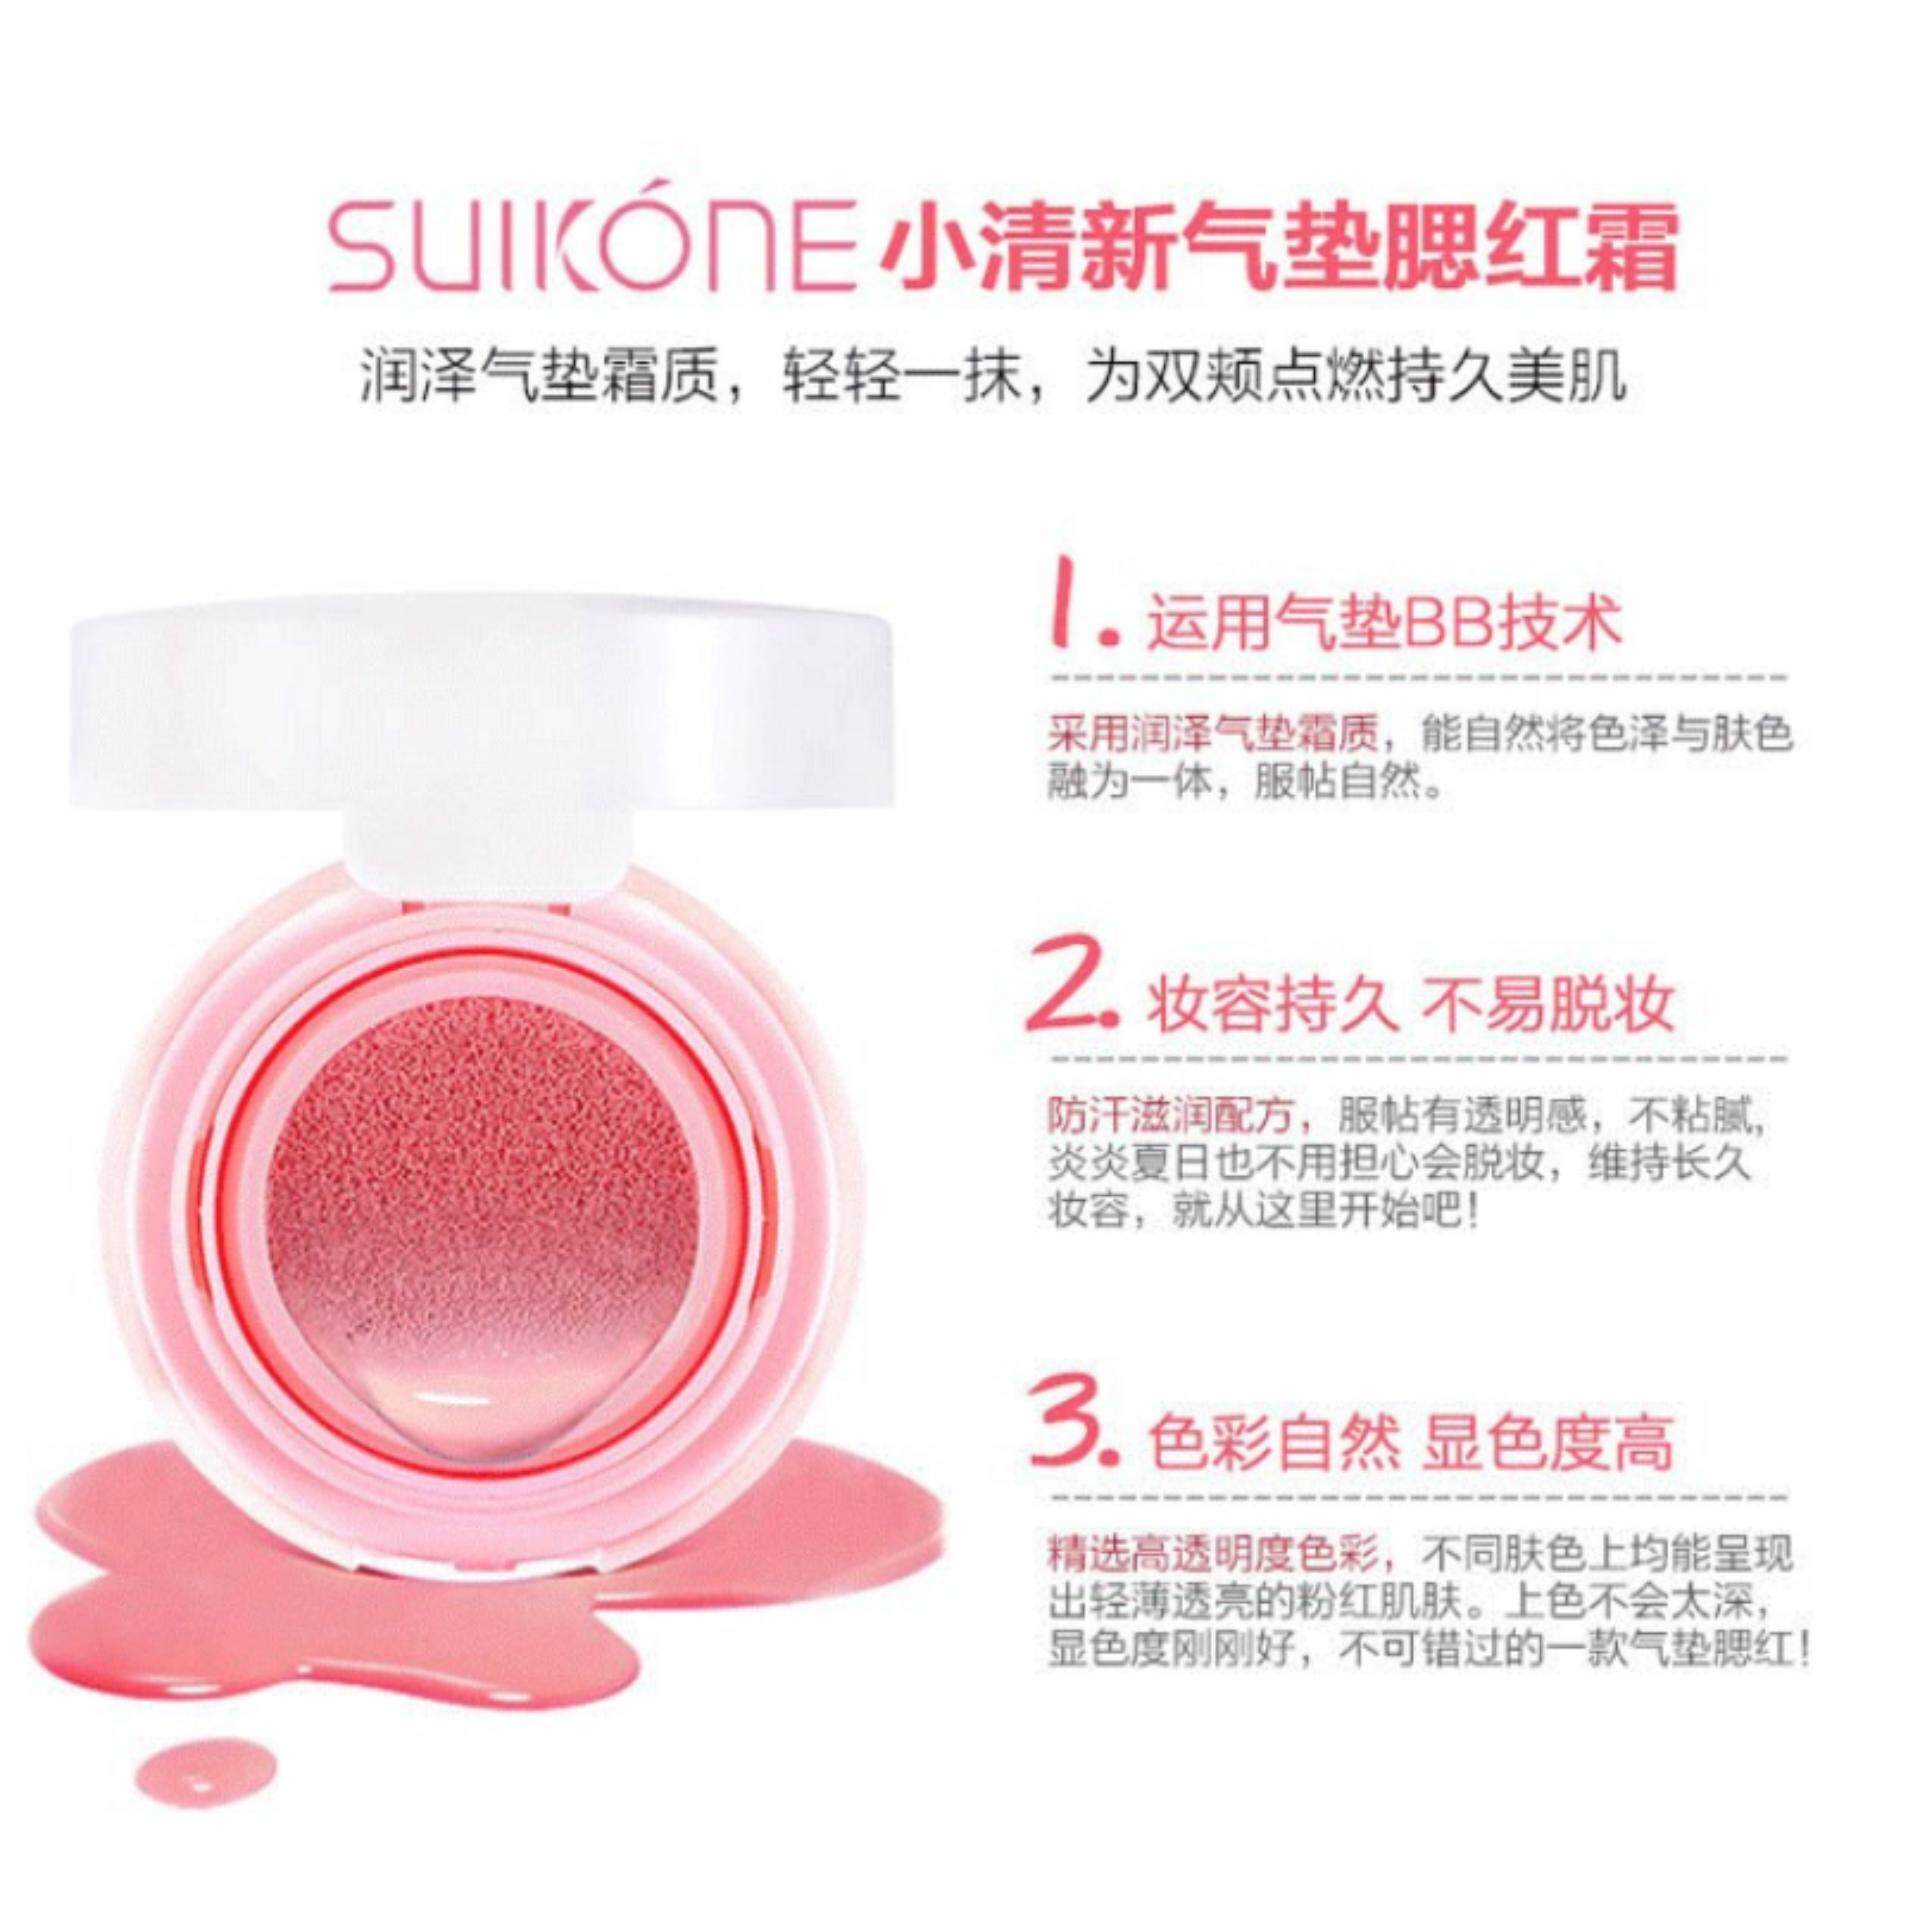 Bioaqua Blush On Cushion Smooth Muscle Flawless 01 Pink Daftar Peach 02 Cheek Suikone Blusher Malaysia